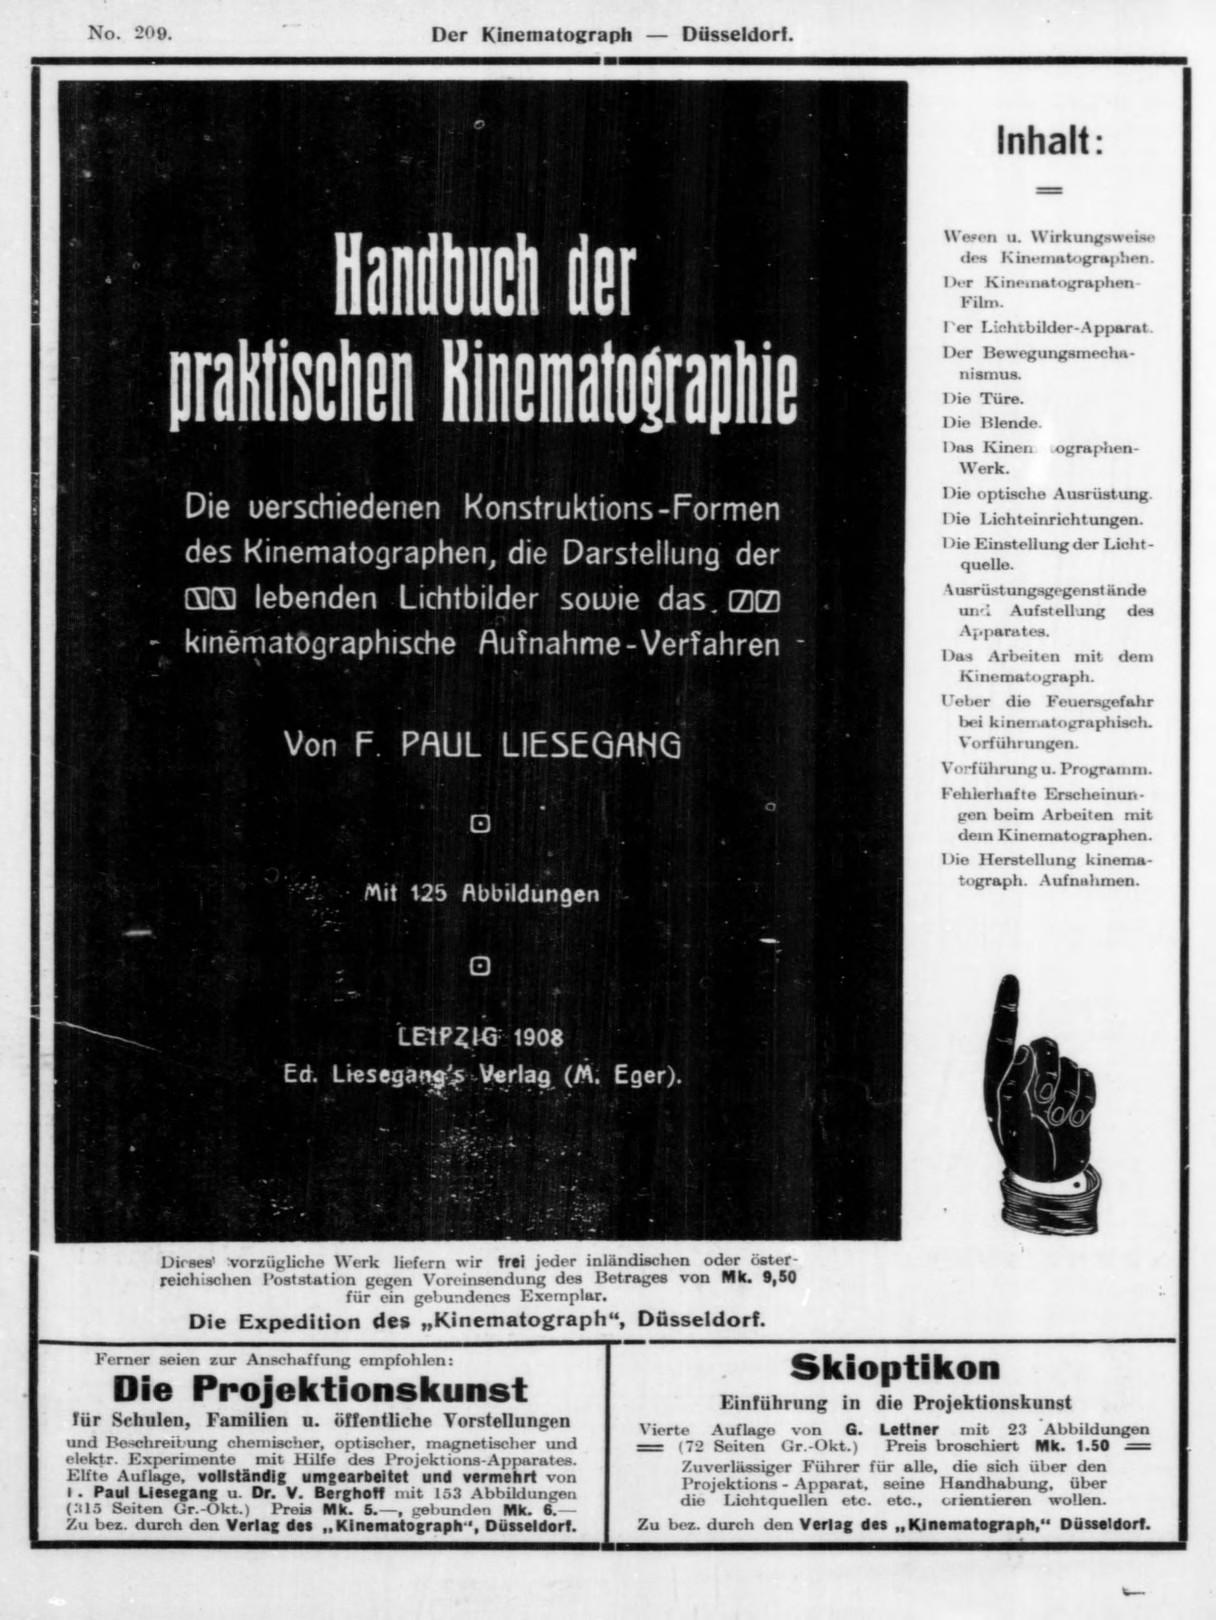 Kinematograph04-1910-12_jp2.zip&file=kinematograph04-1910-12_jp2%2fkinematograph04-1910-12_0105